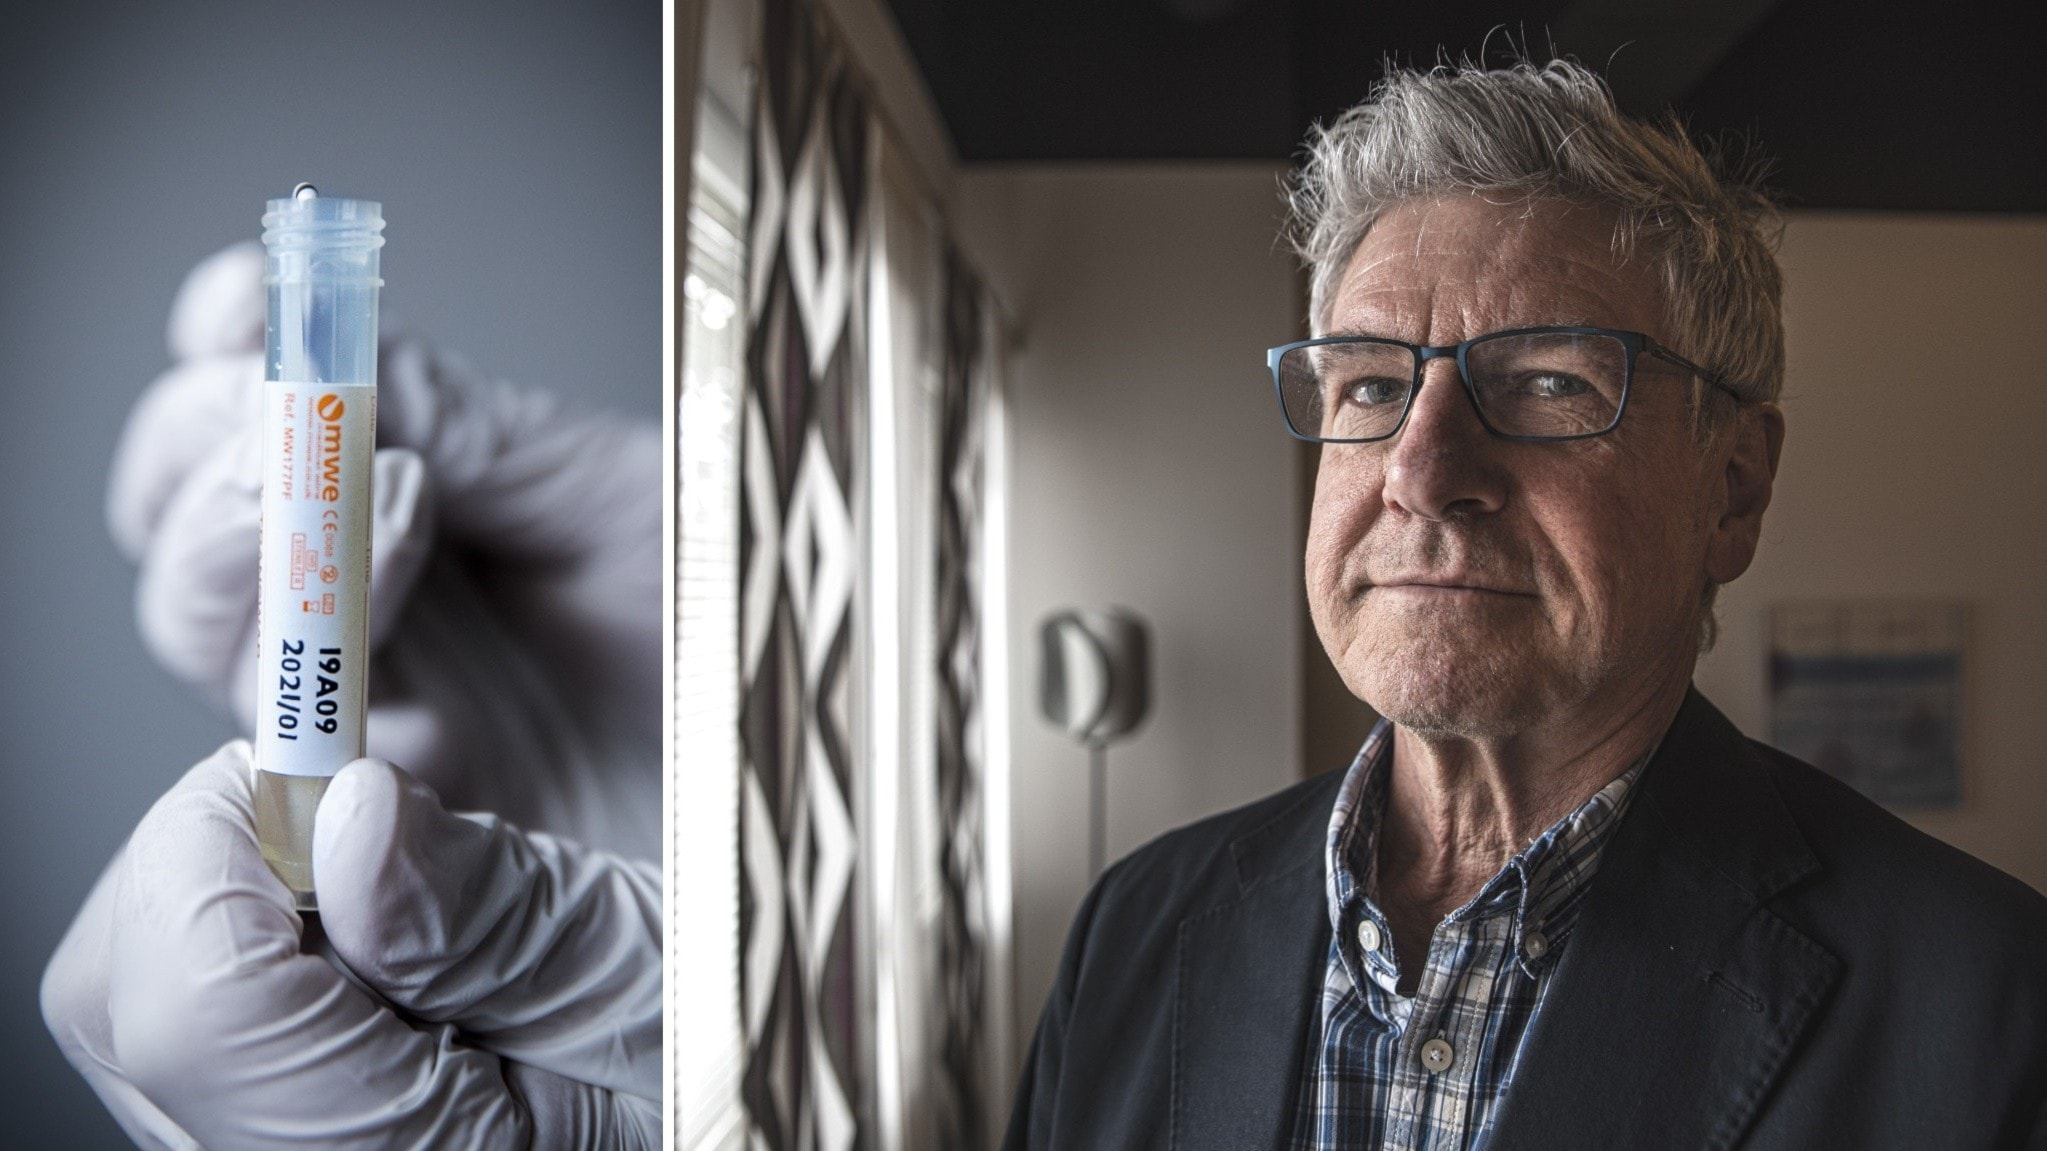 Sex annons i norberg vstmanland kvinna sker man